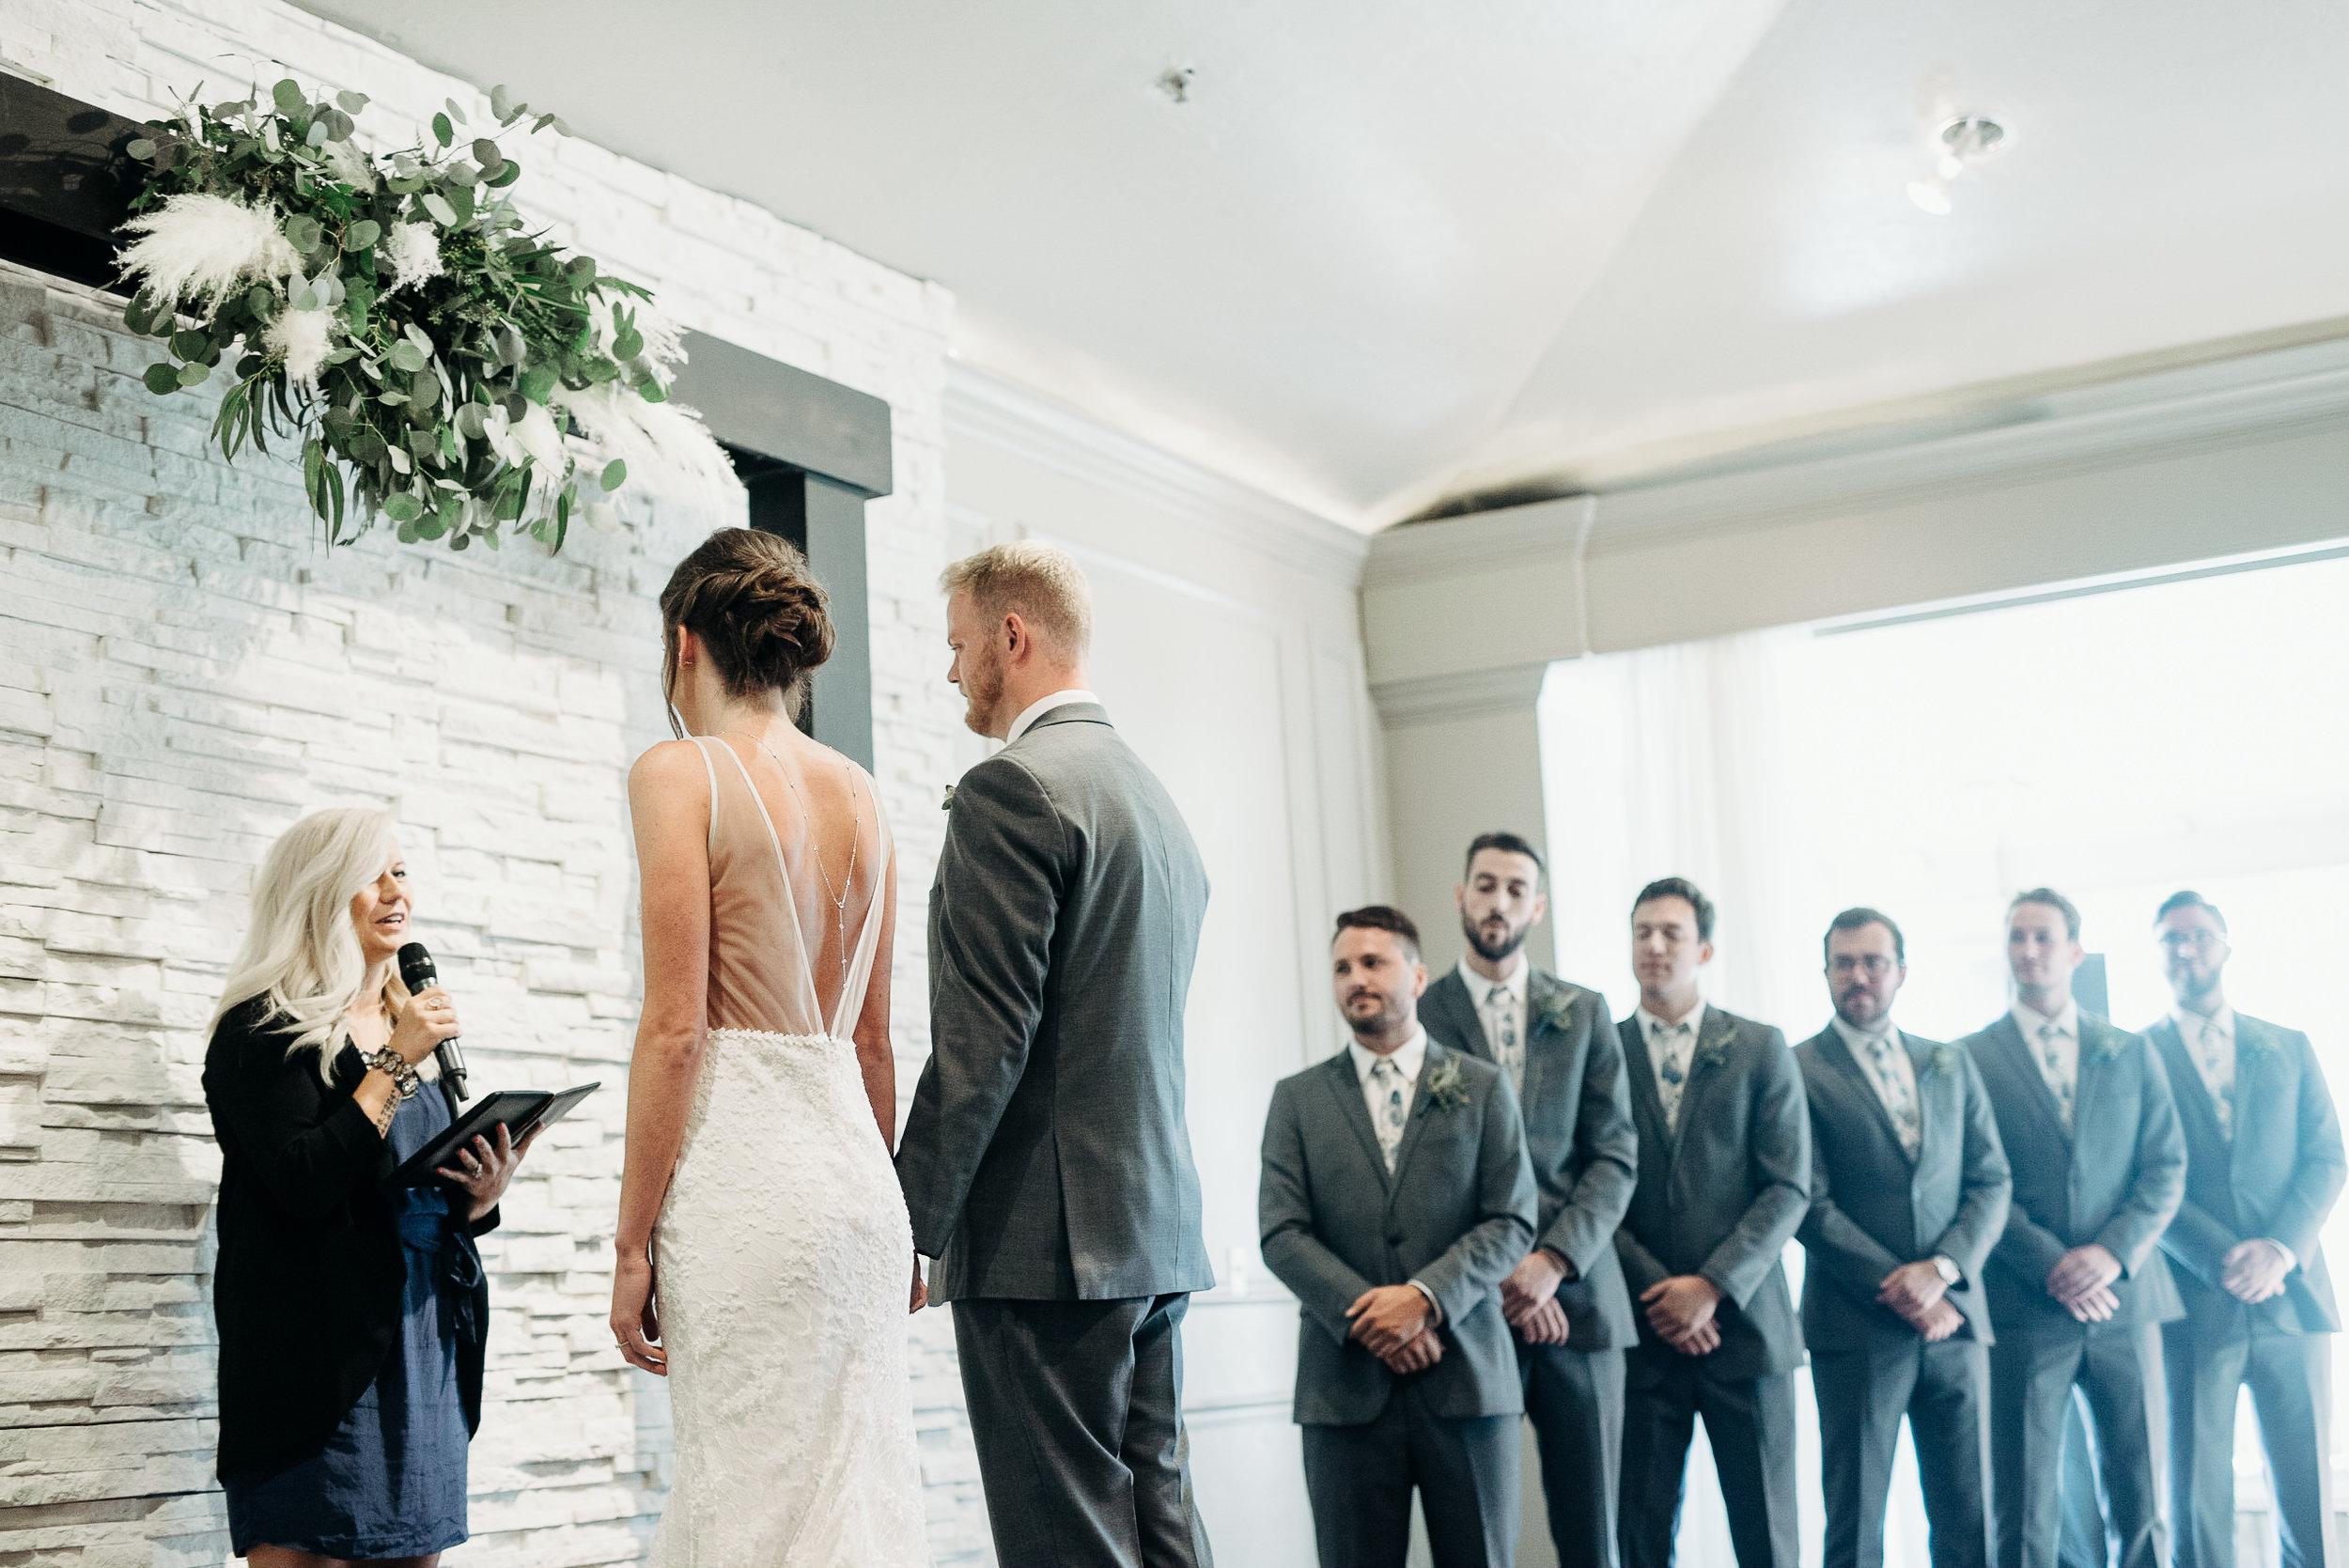 okc-wedding-photographer-coles-garden-wedding-okc-best-wedding-photographers-116.jpg